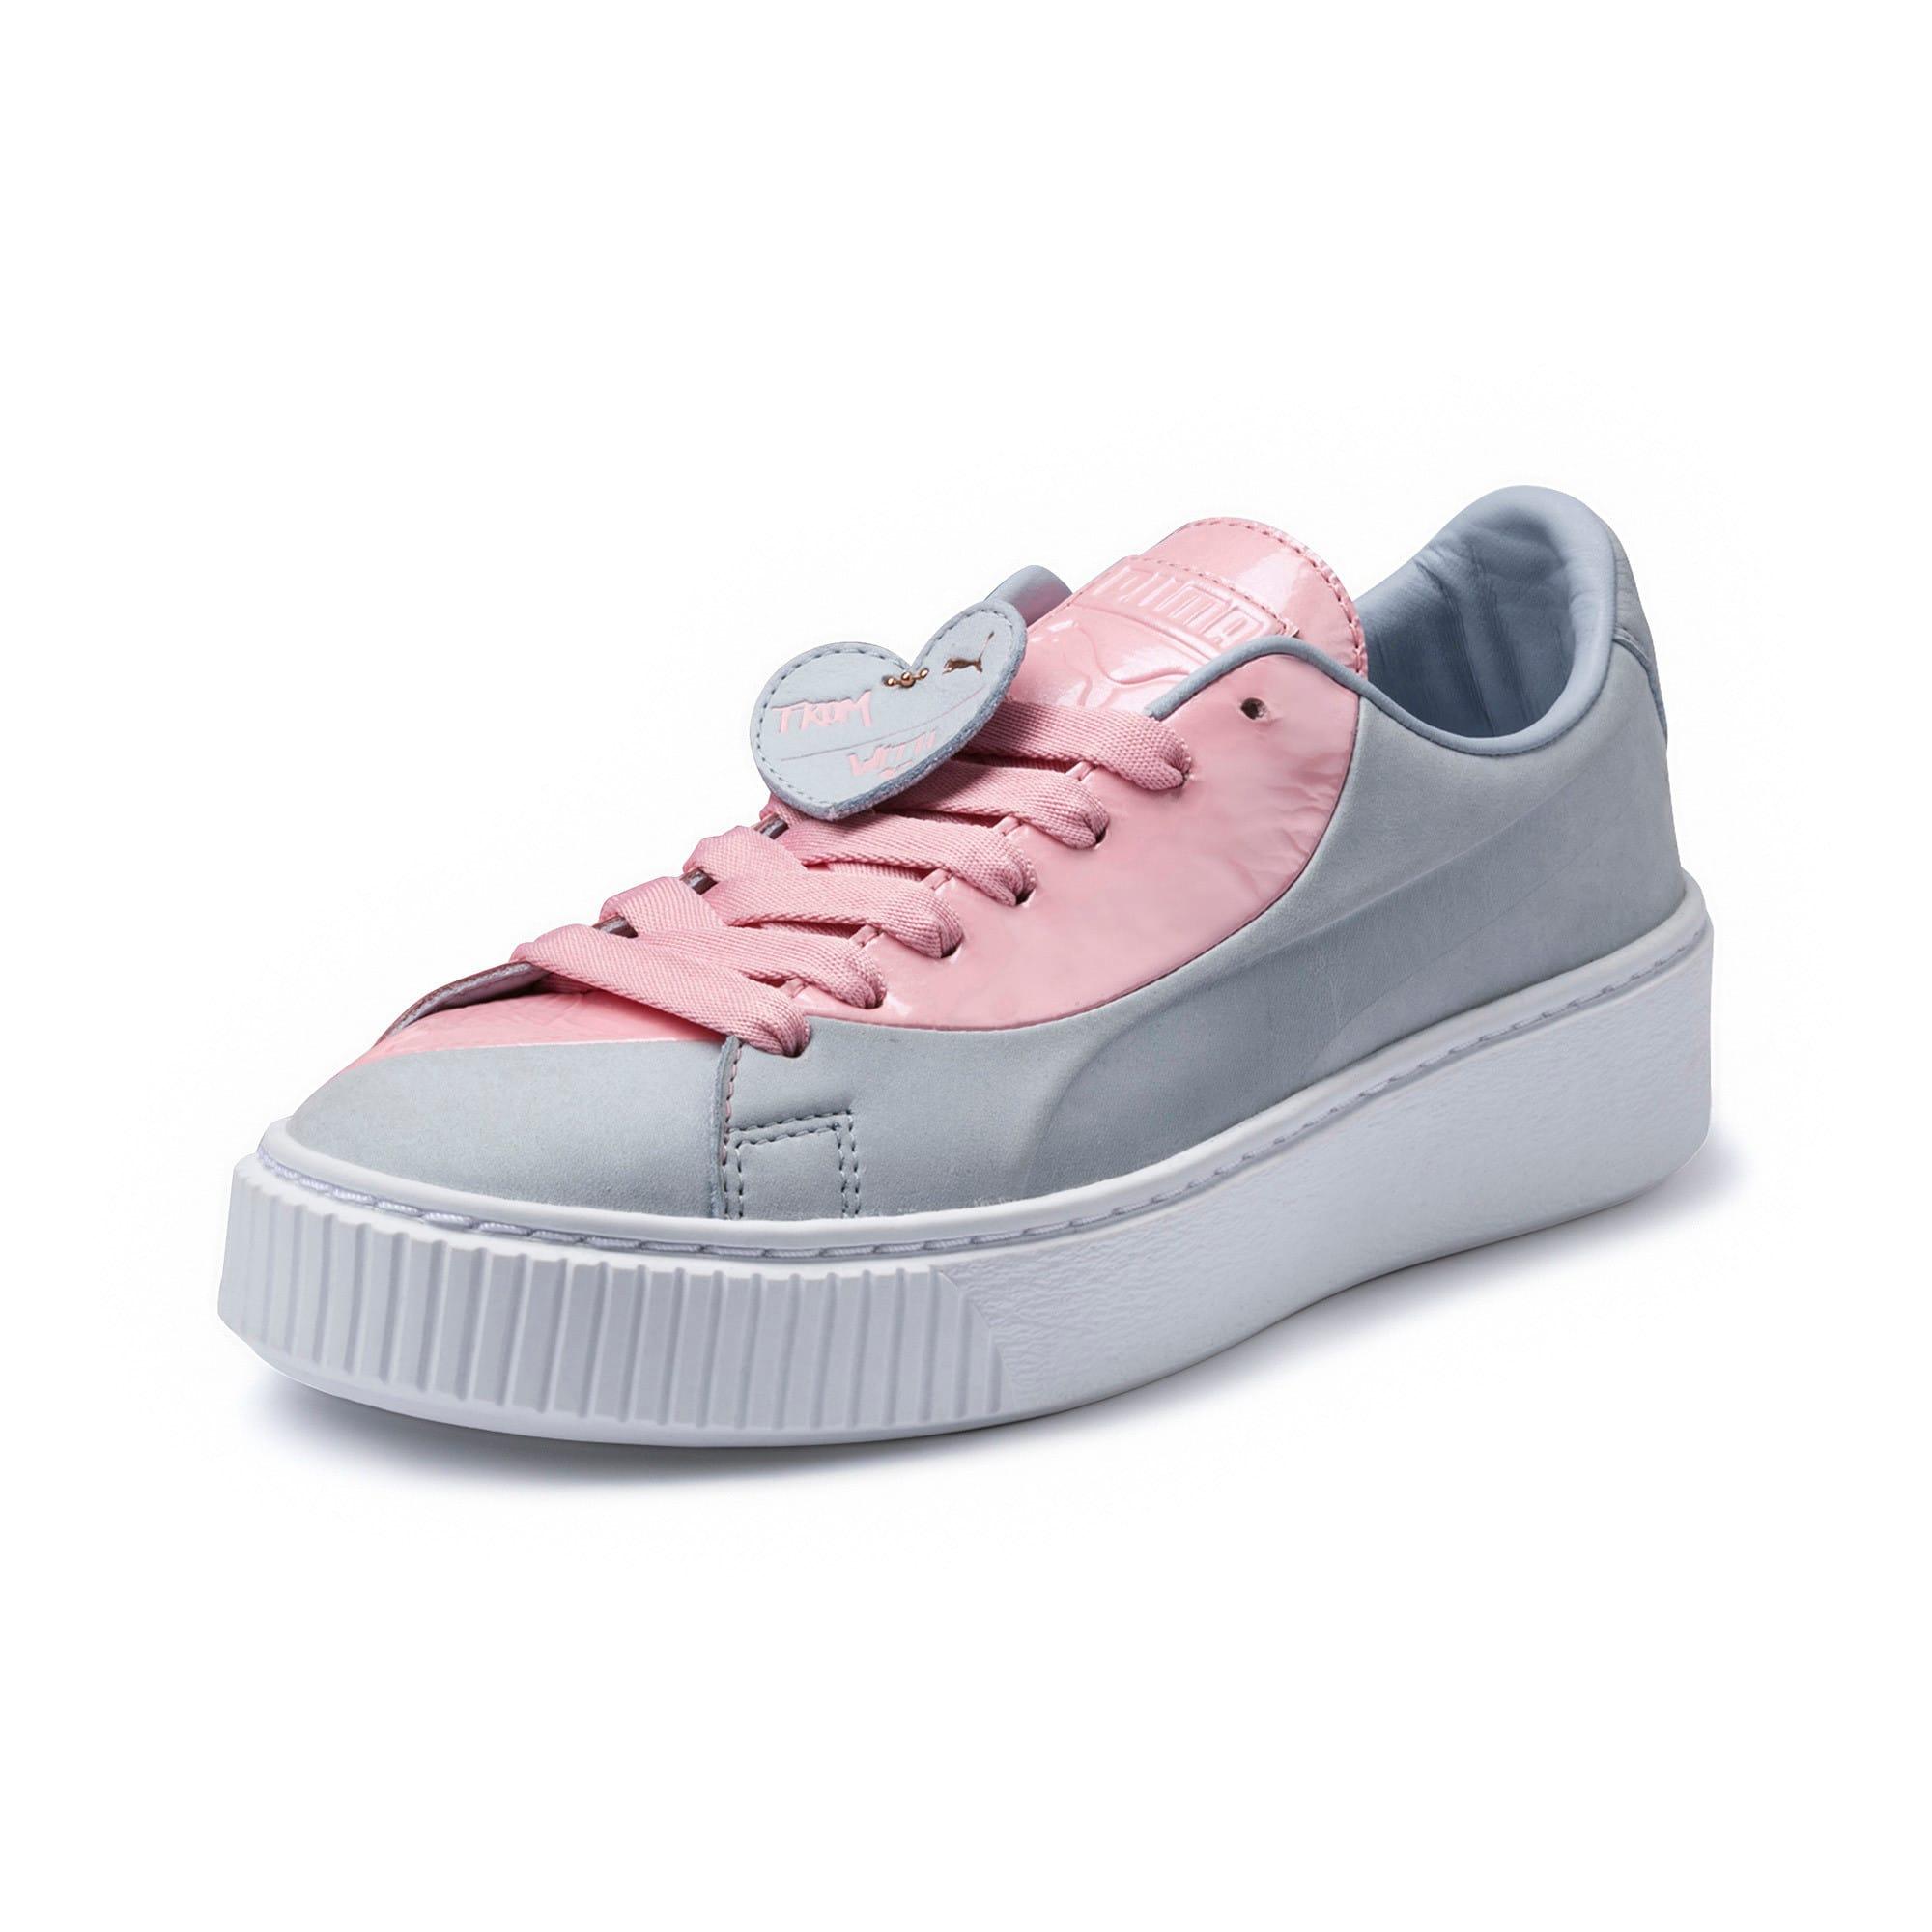 100% authentic 0ae96 44710 Basket Platform Valentine Women's Sneakers